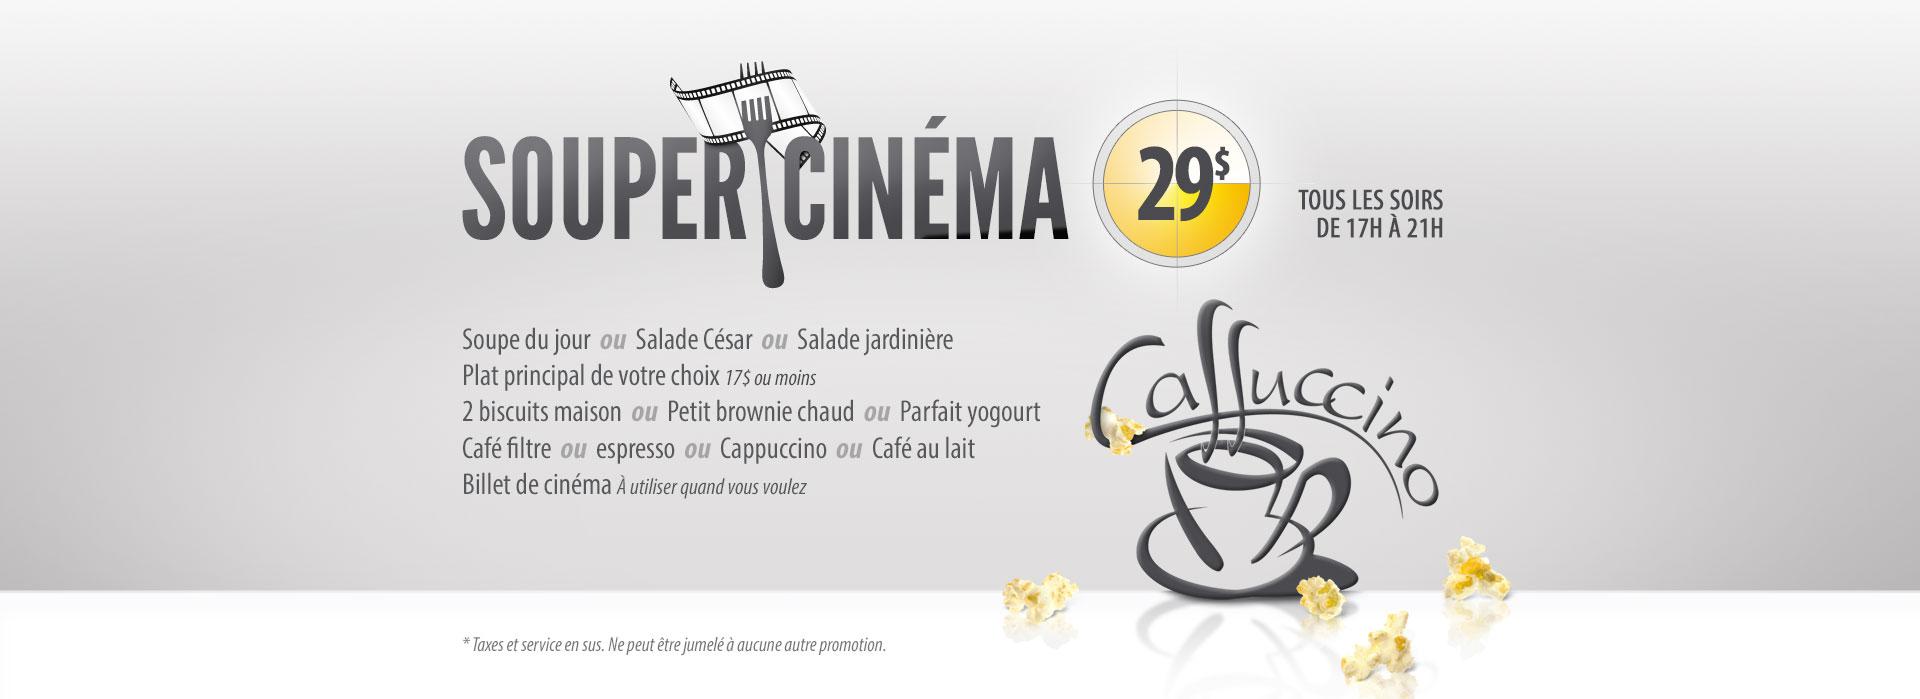 Caffuccino - Forfait Souper-Cinéma